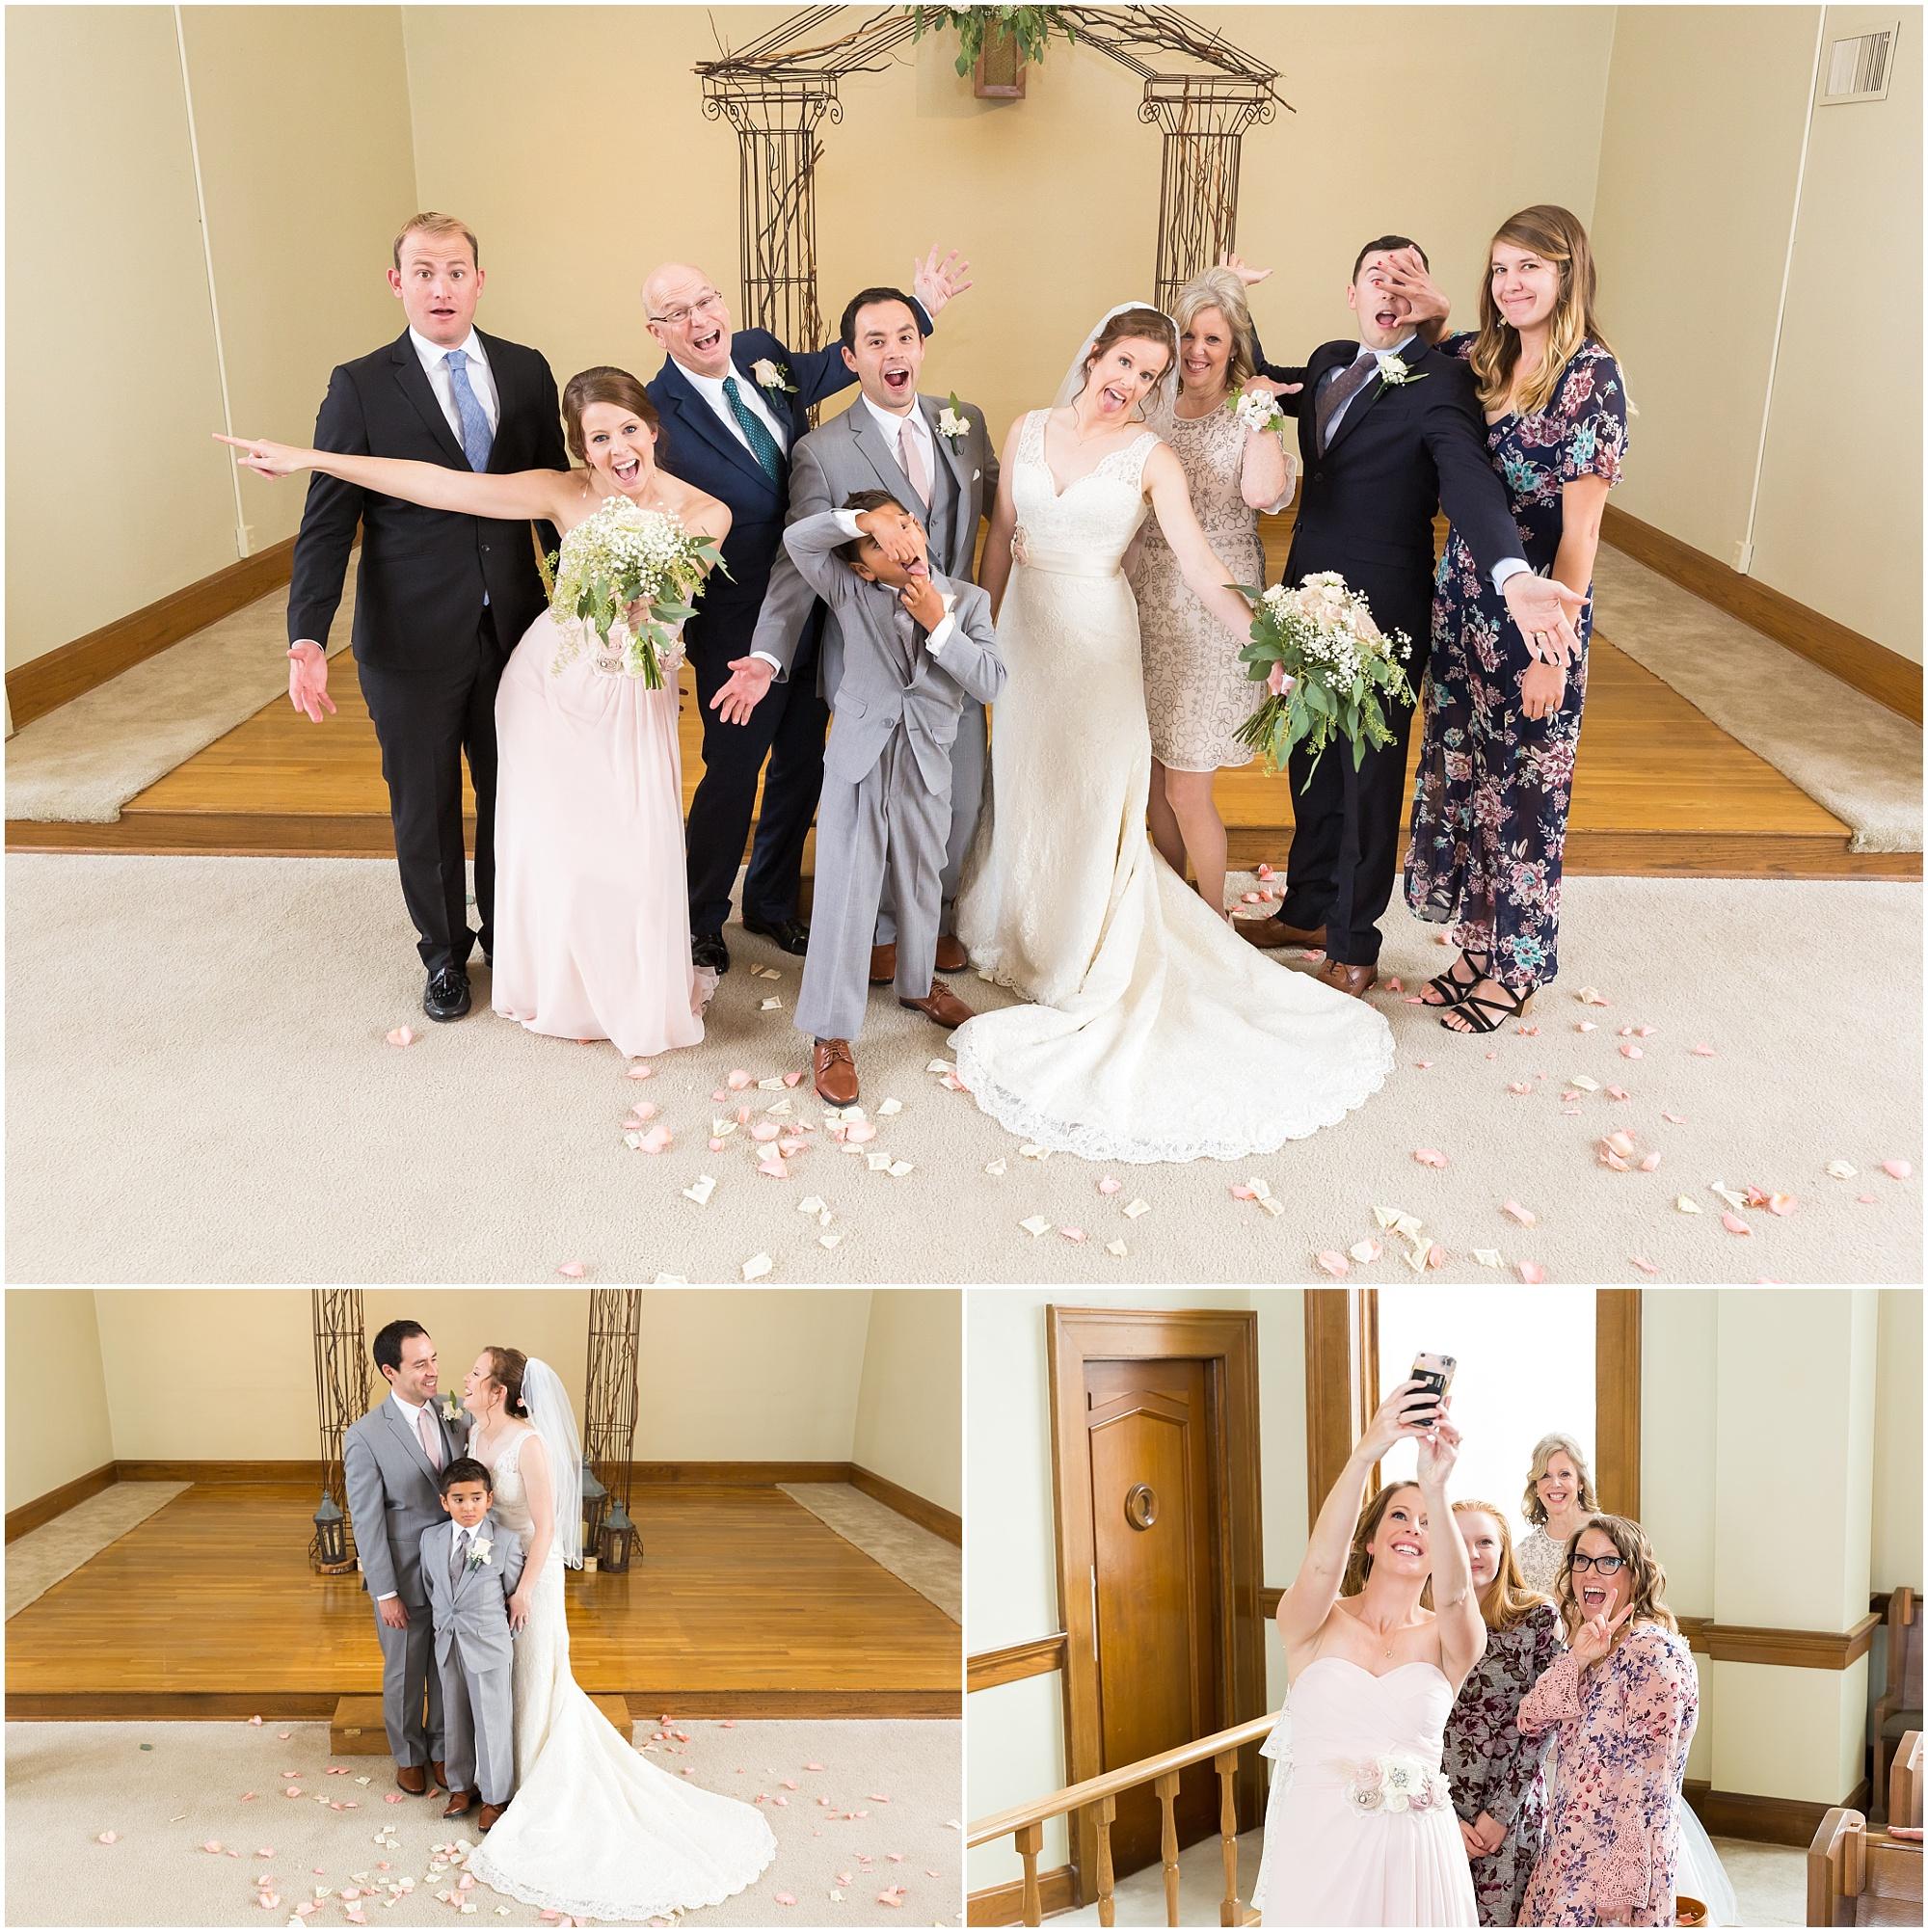 Downtown-Waco-Fall-Wedding_0022.jpg